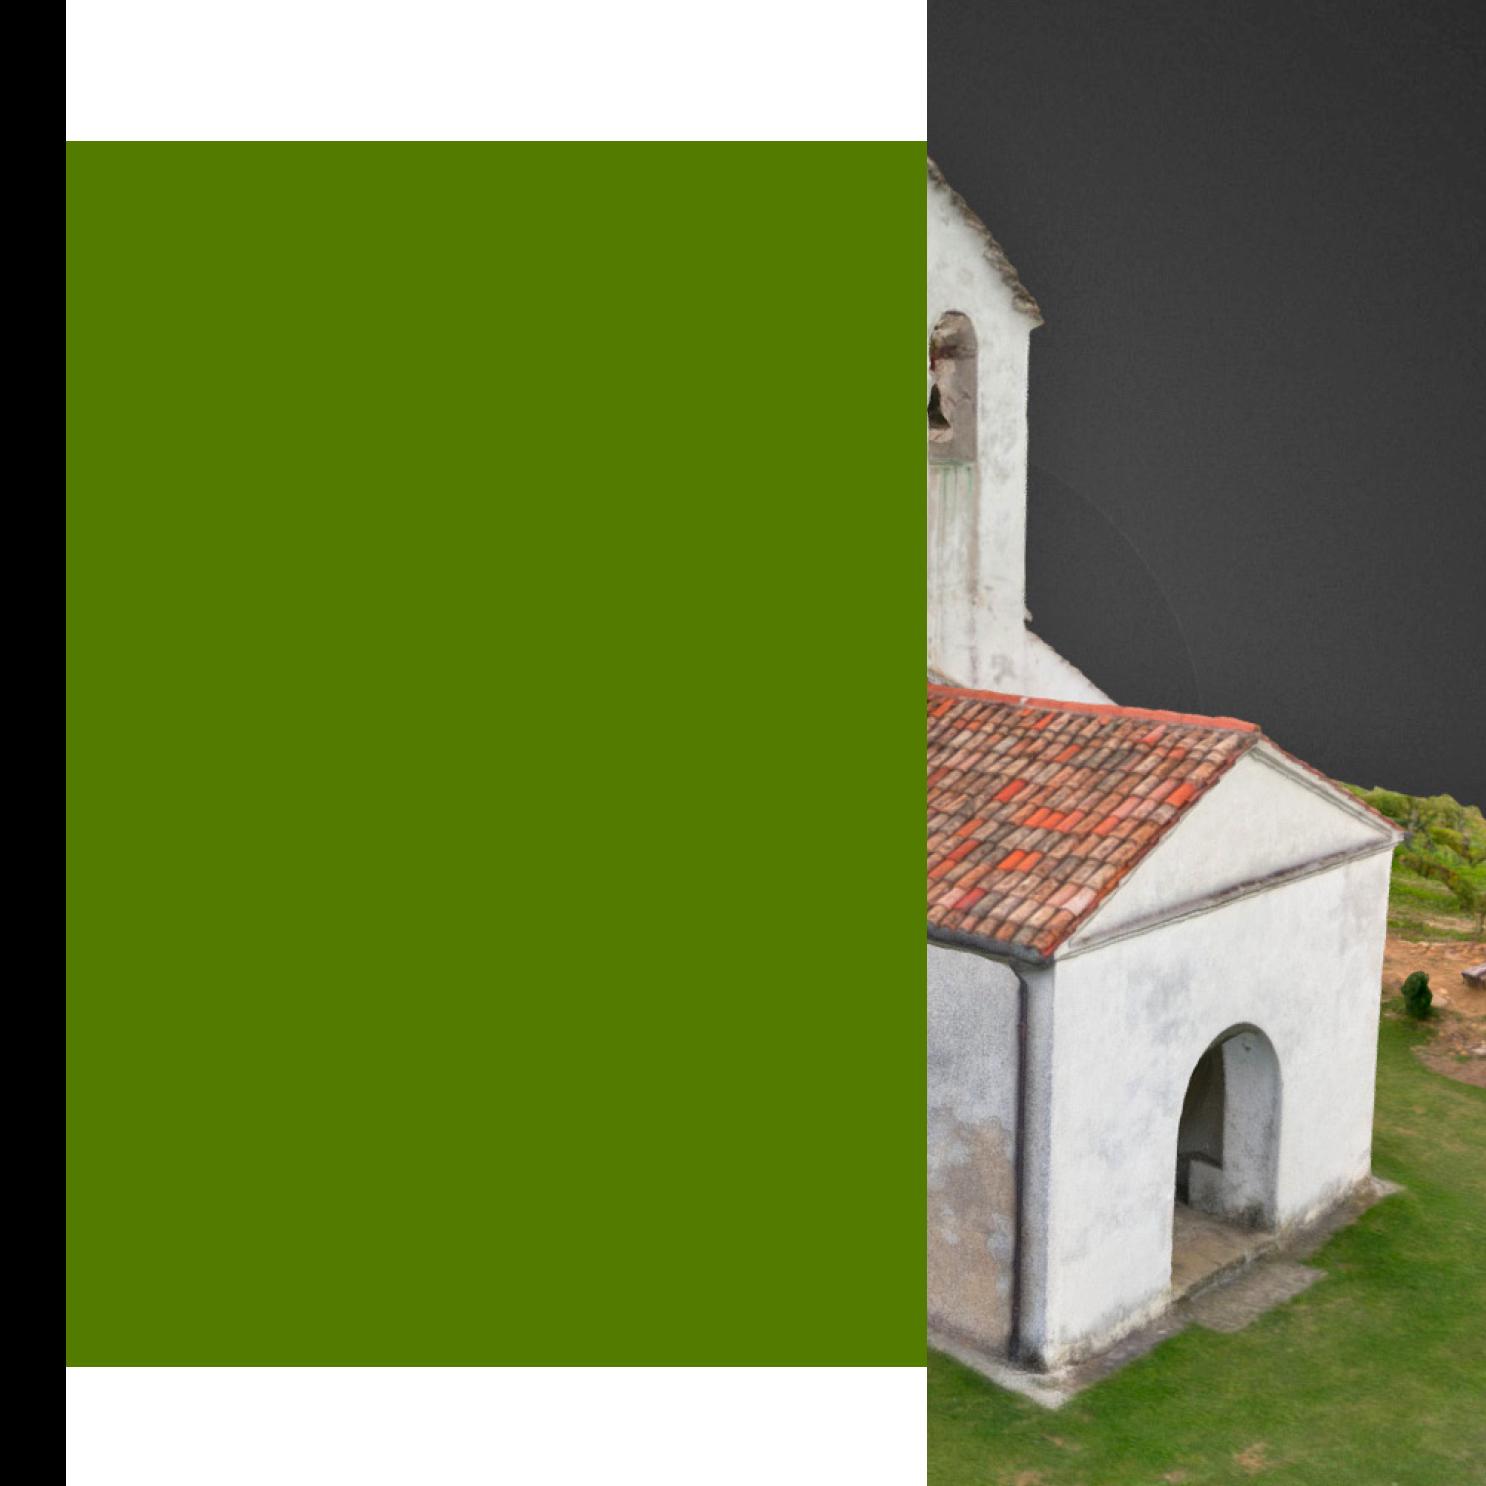 3D and 360° digital capture